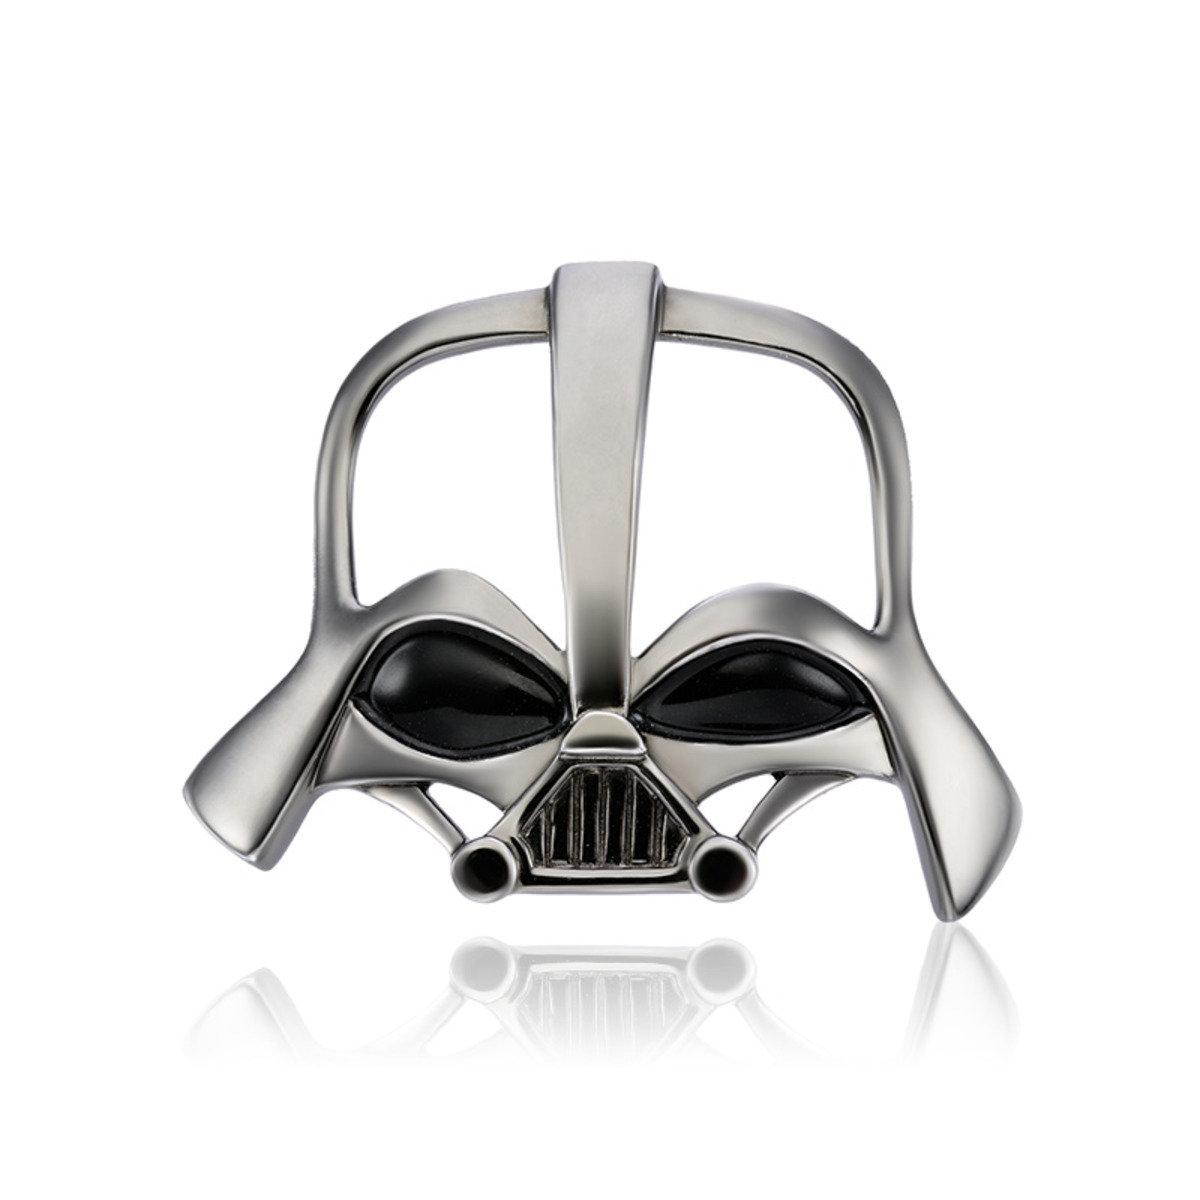 星球大戰系列黑武士925銀吊墜 (Darth Vader)